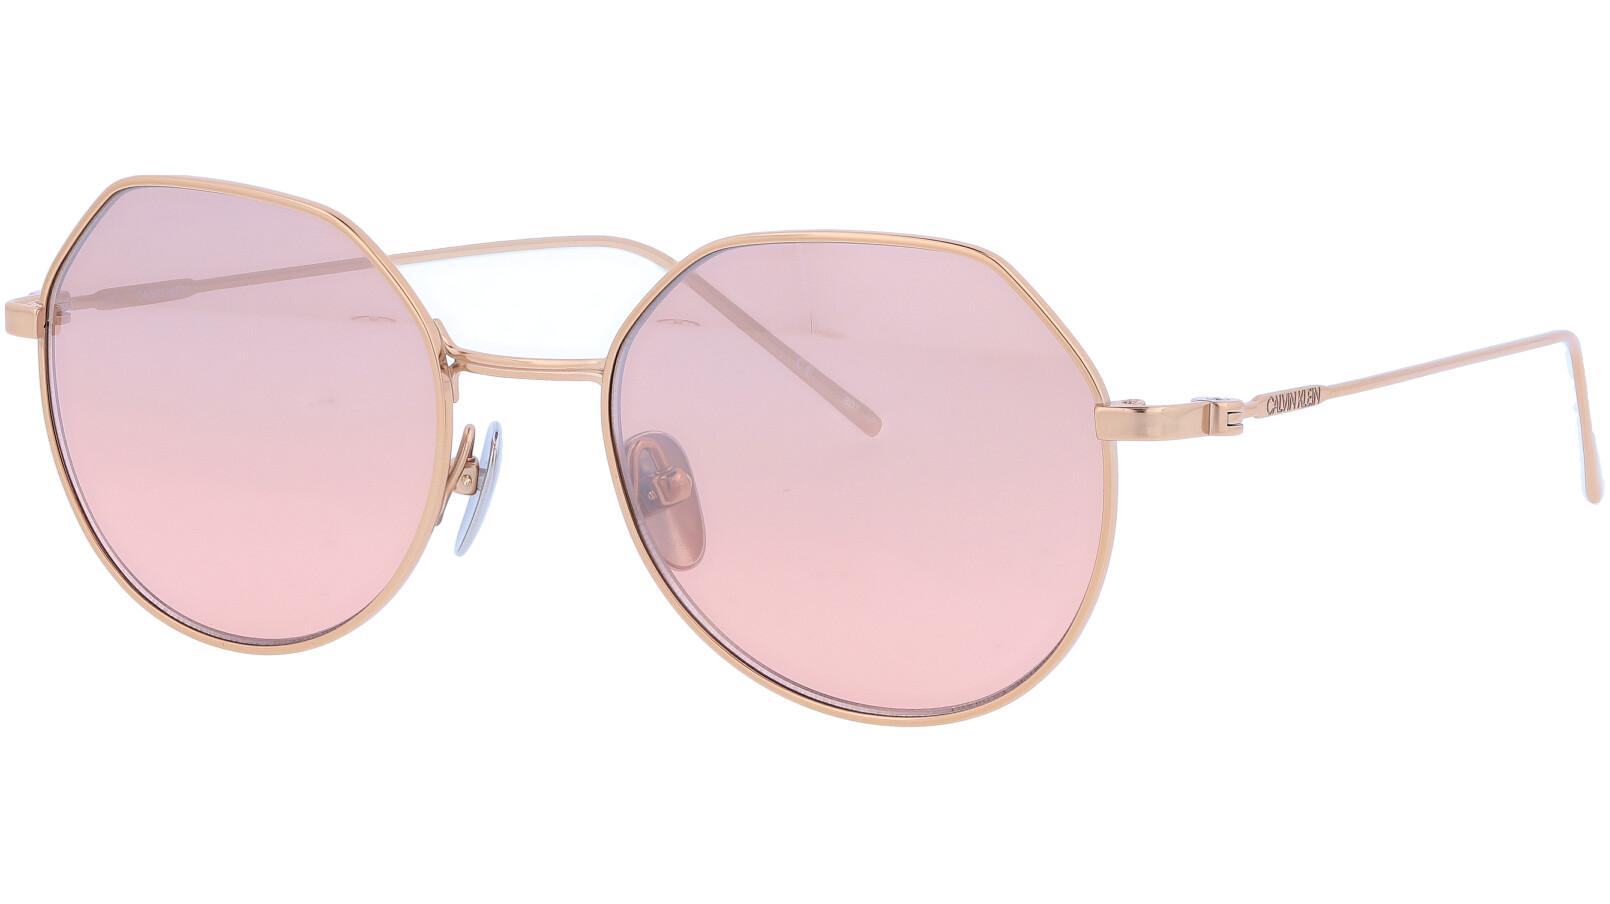 Calvin Klein CK18111S 780 51 Rose Sunglasses